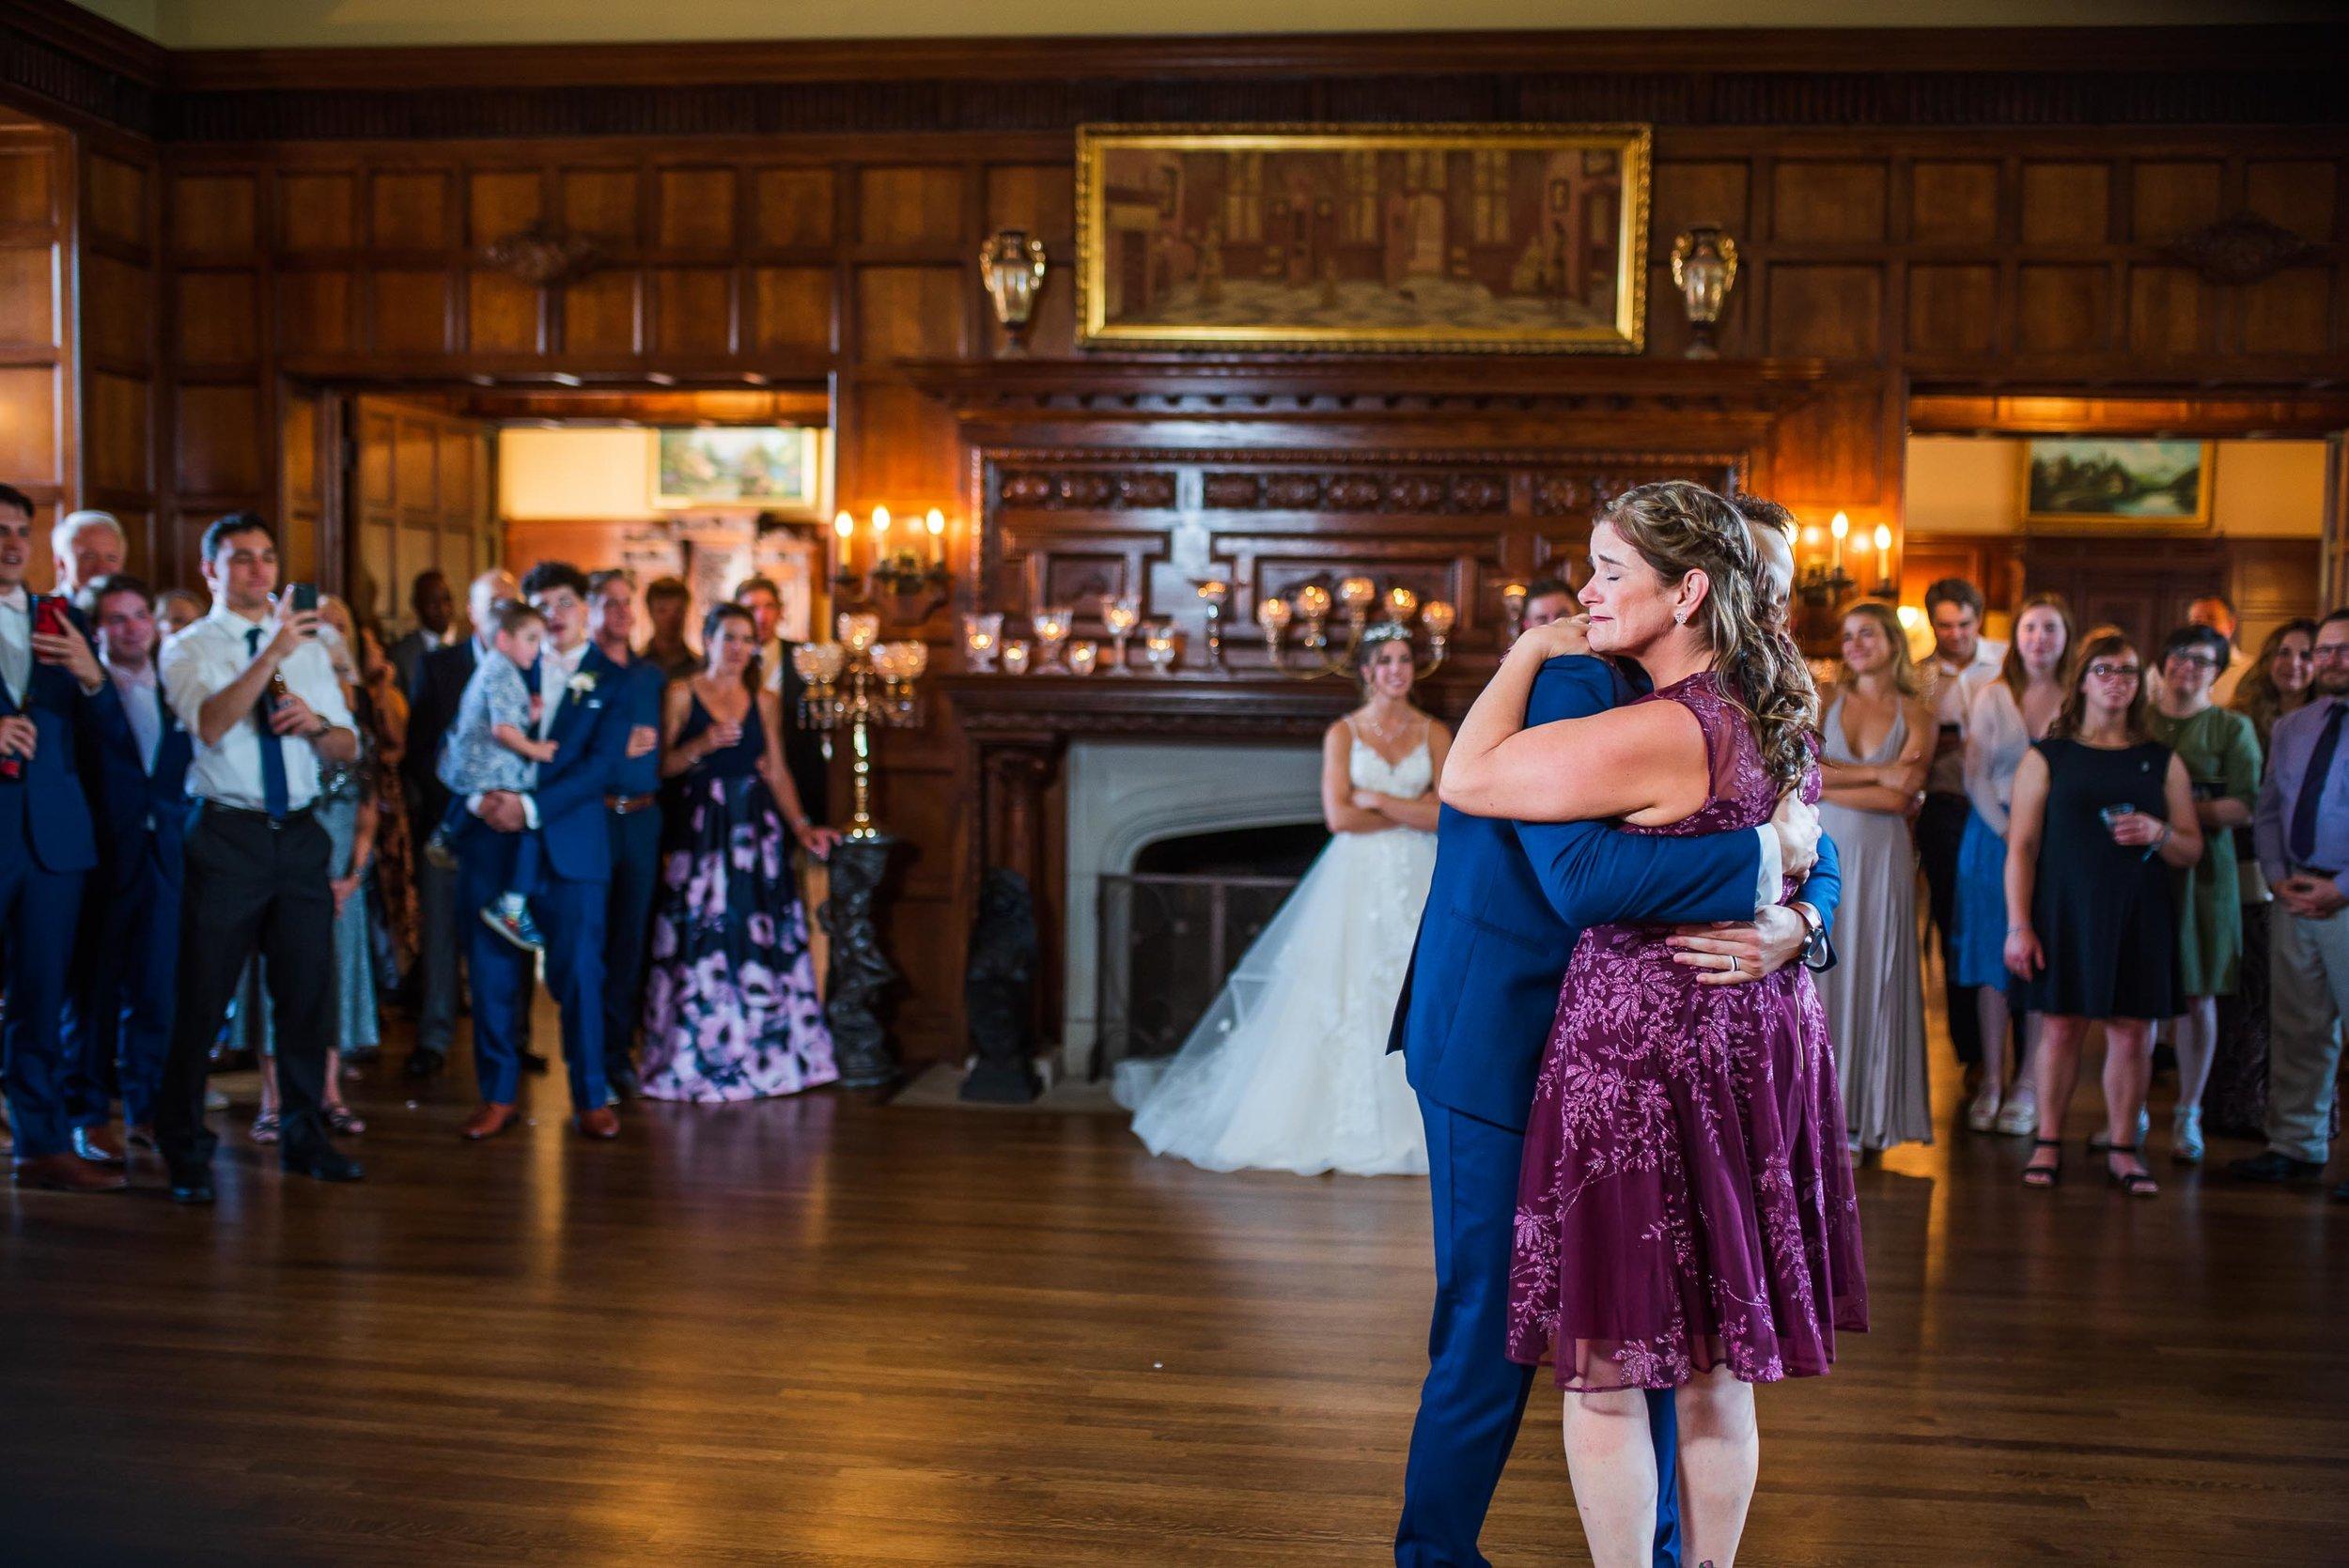 thornewood castle wedding 70.jpg